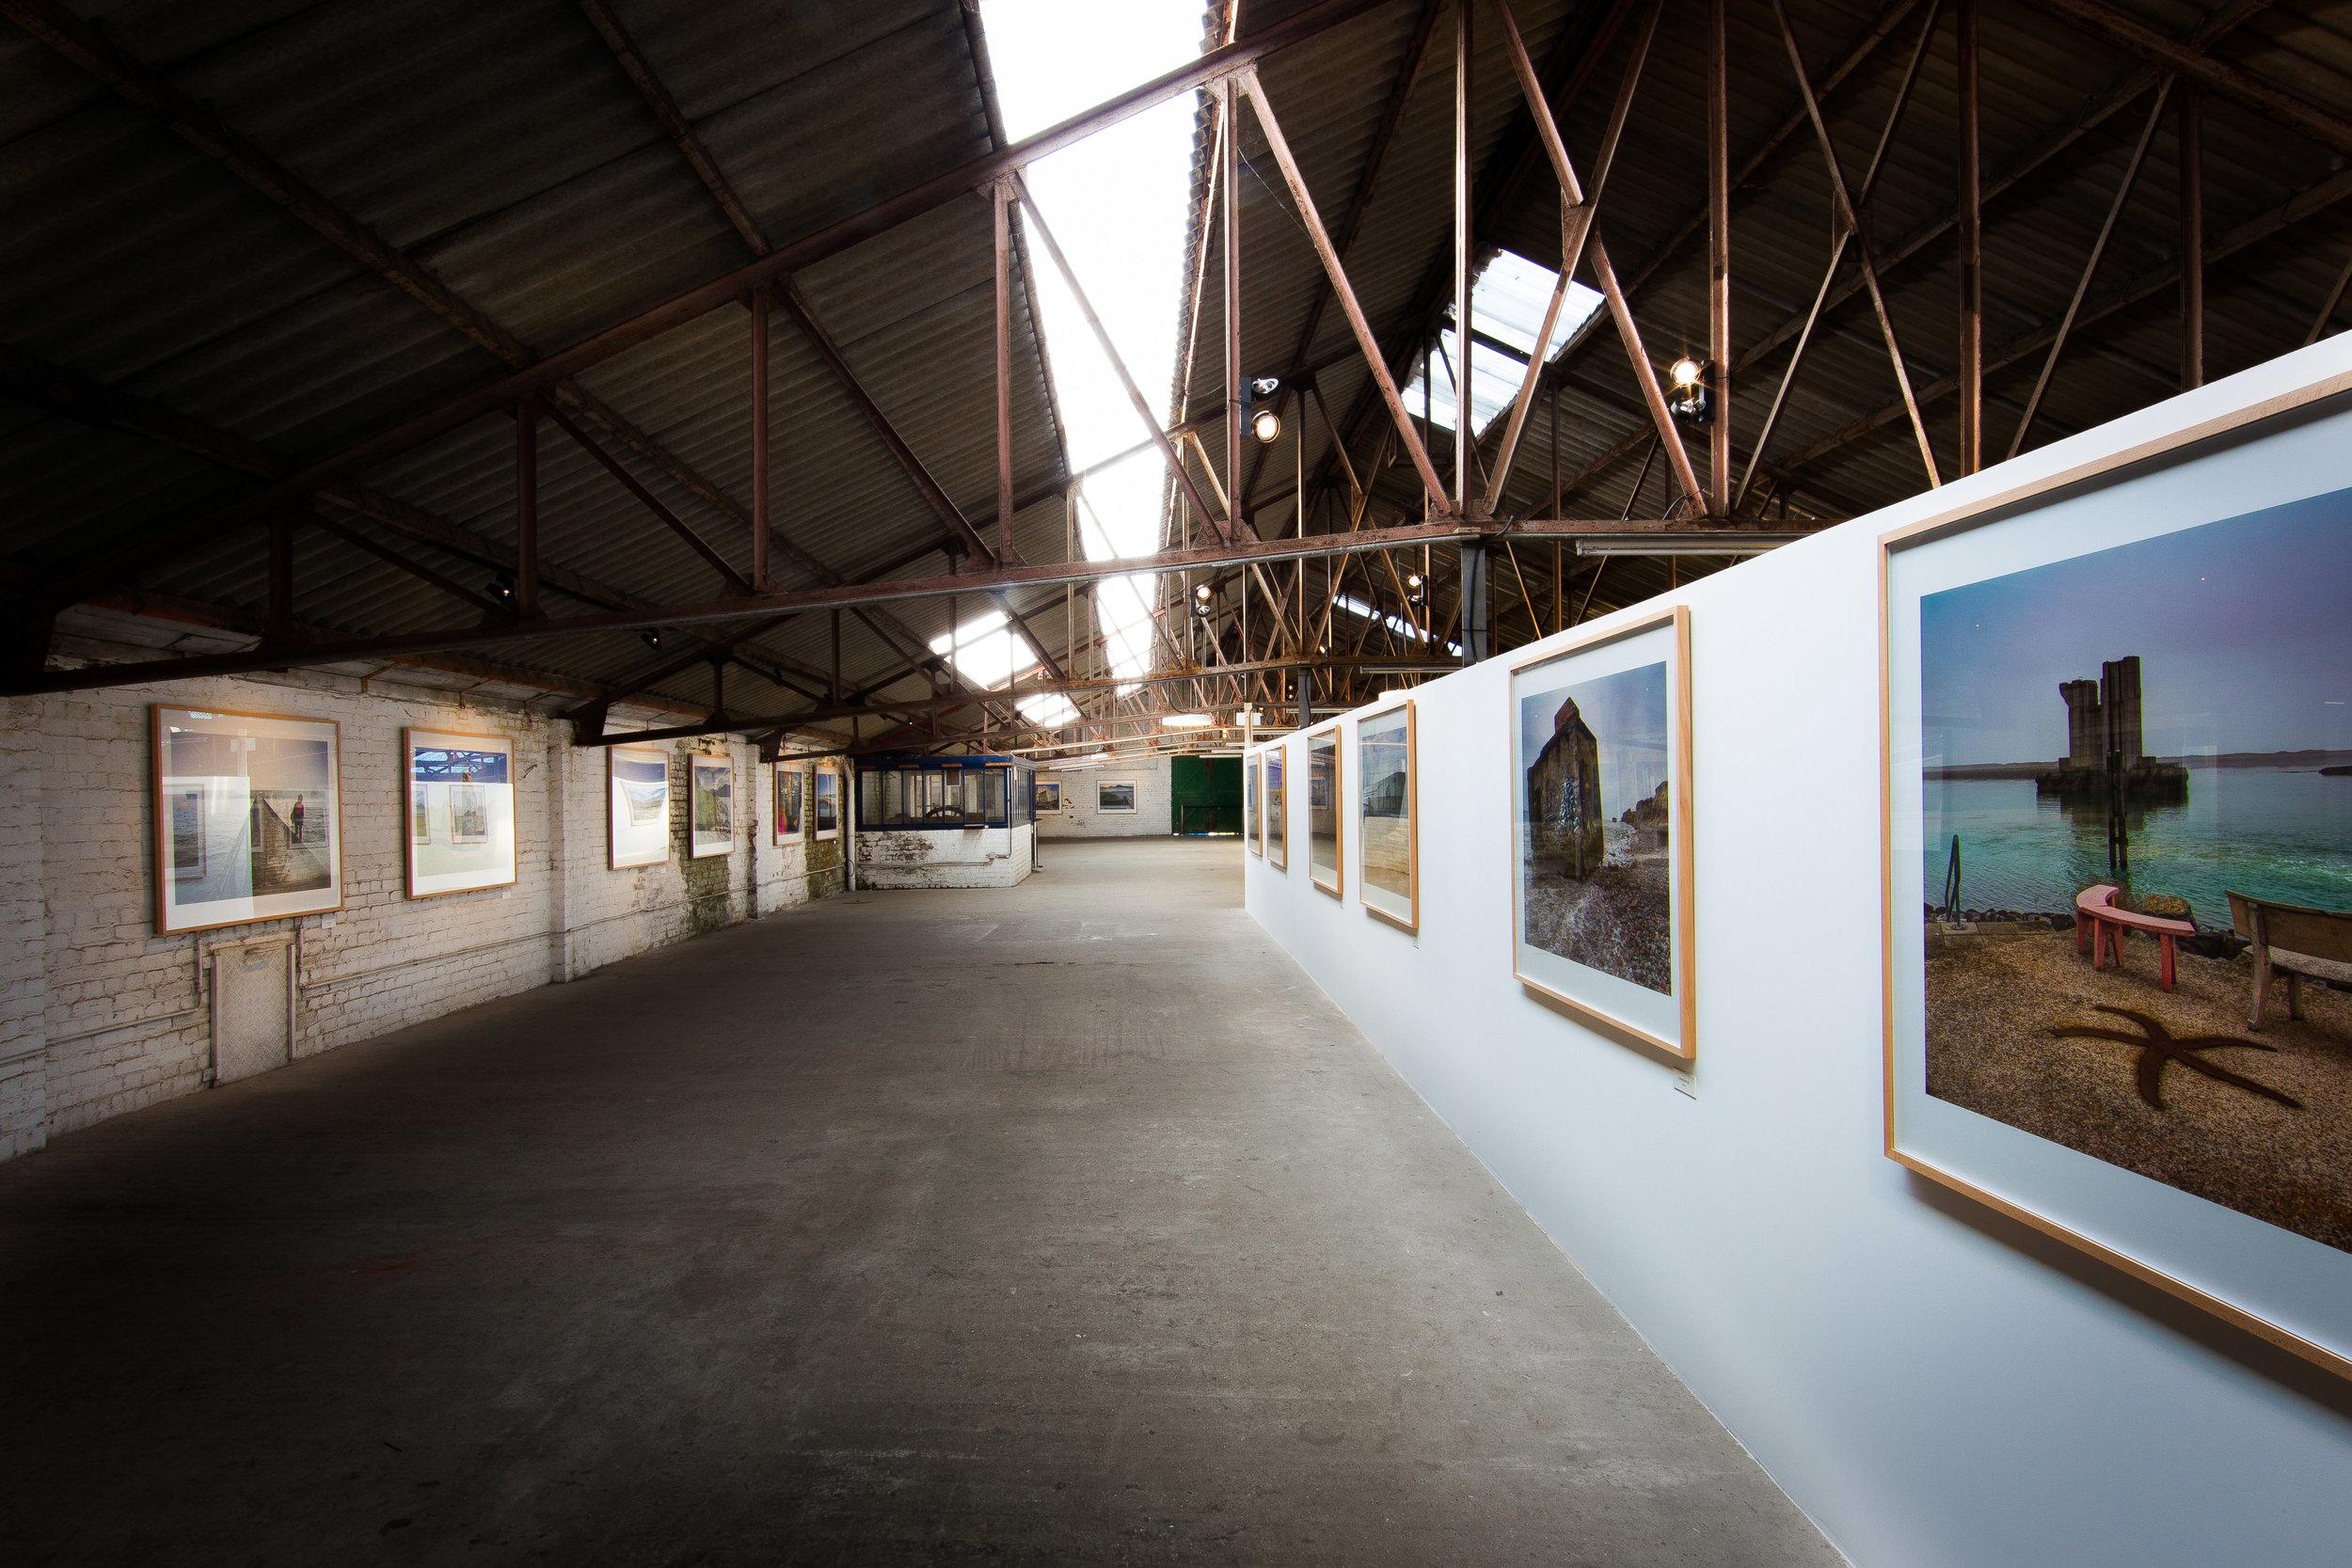 Tentoonstelling Carl De Keyzer - Oostende 2012 - Fotografie Valerie Clarysse - 20.jpg